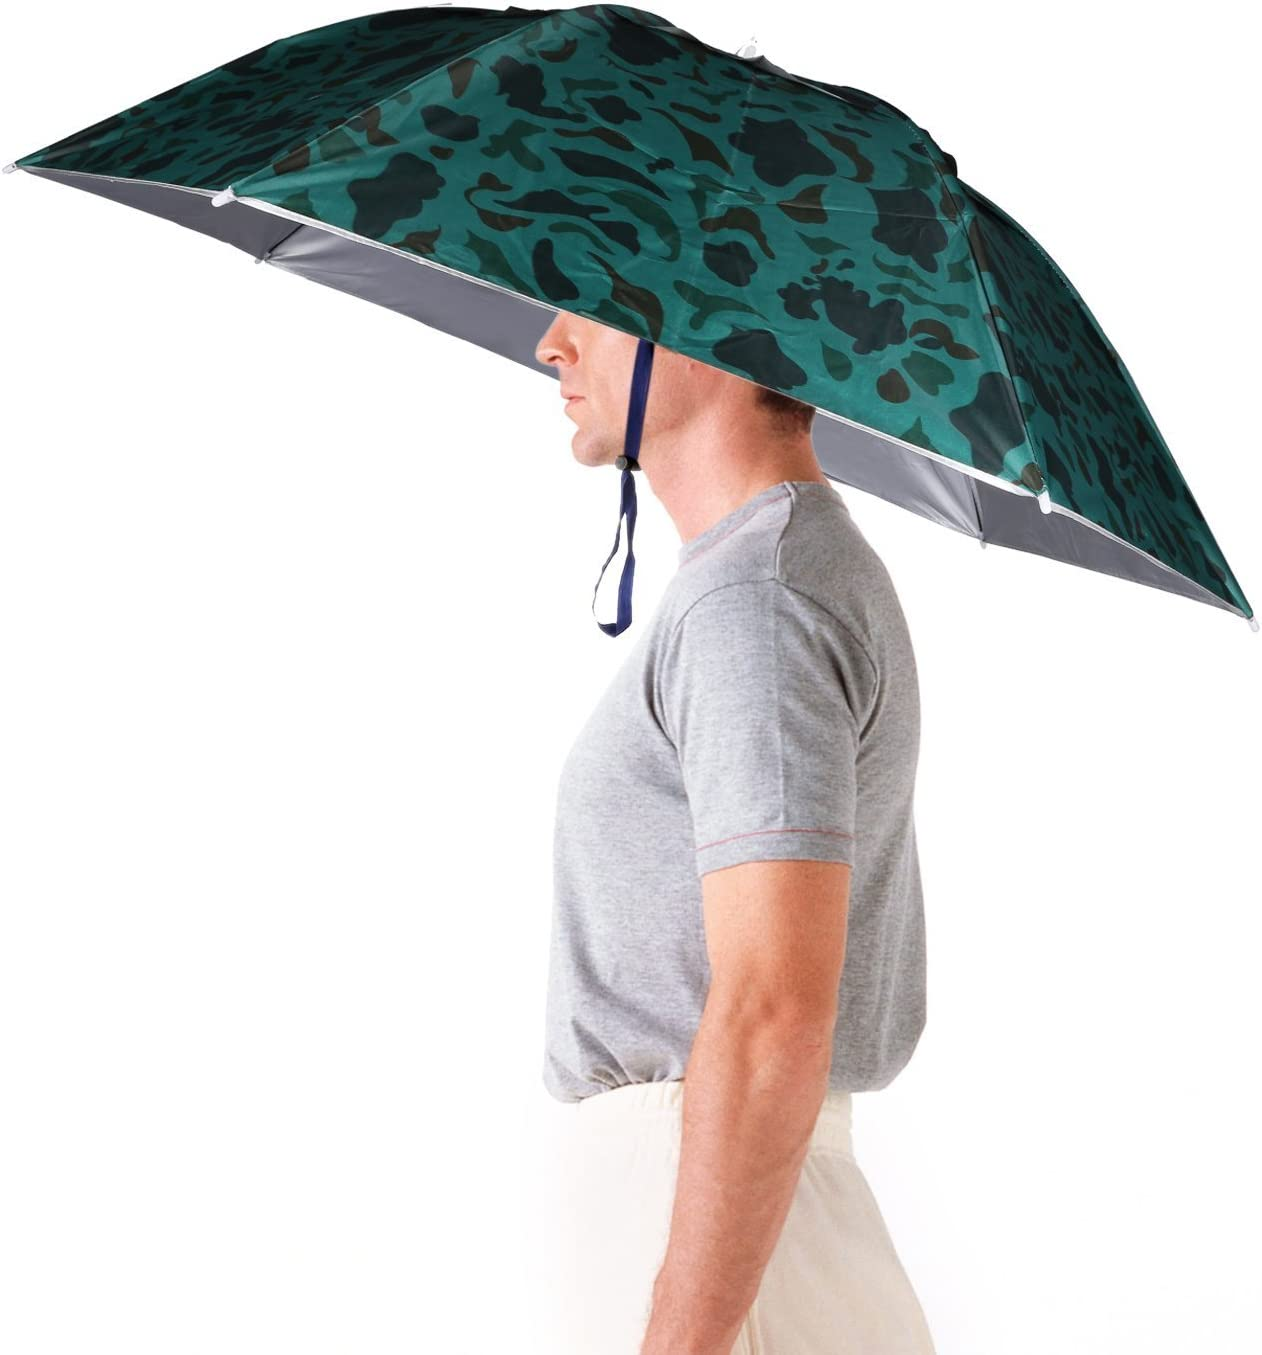 Luwint 36'' Diameter Elastic Fishing Gardening Folding Umbrella Hat Headwear